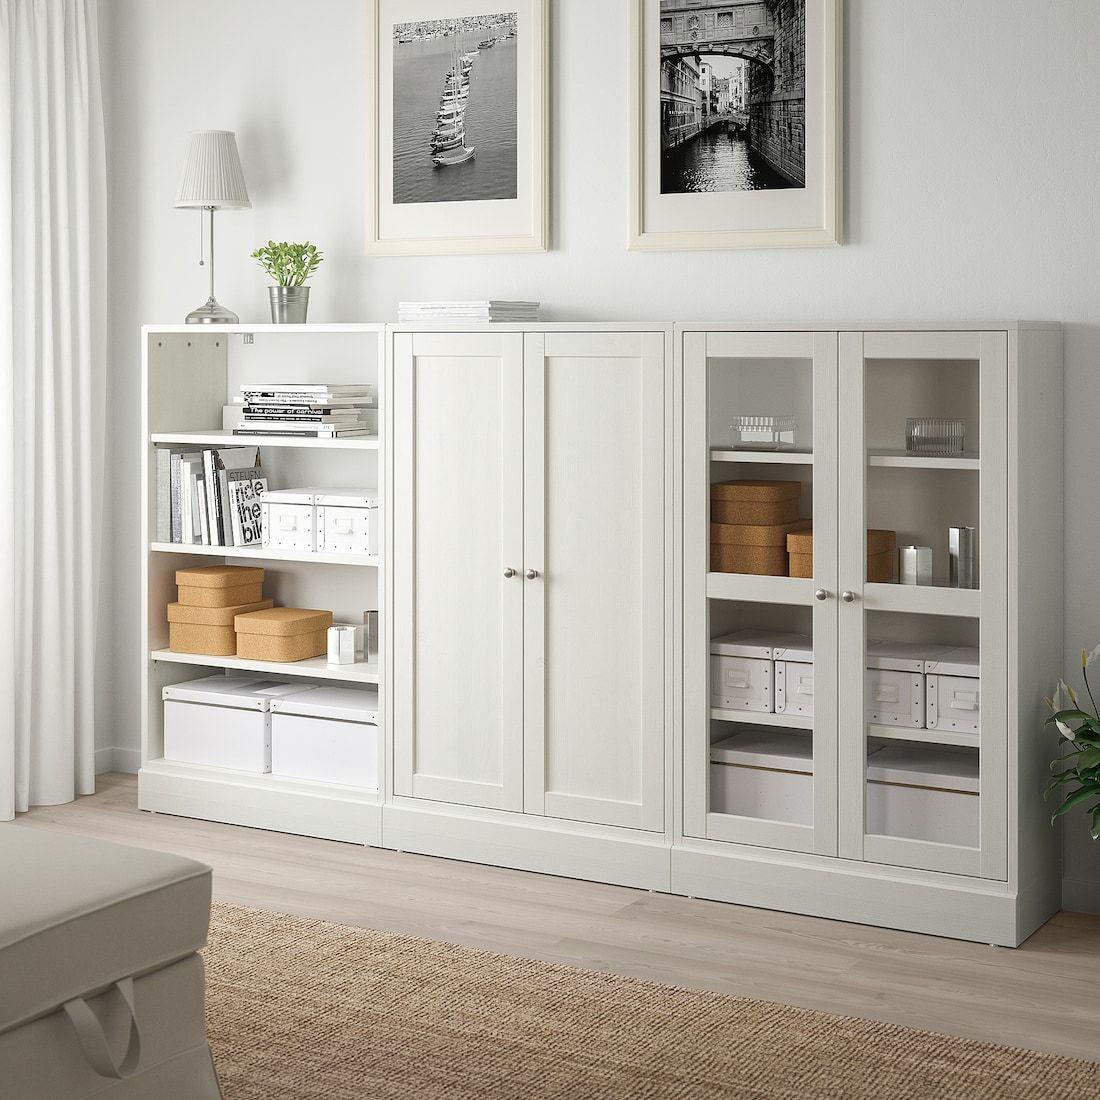 Havsta Storage Combination W Glass Doors White 95 5 8x14 5 8x52 3 4 Ikea Ikea Living Room Living Room Storage Ikea